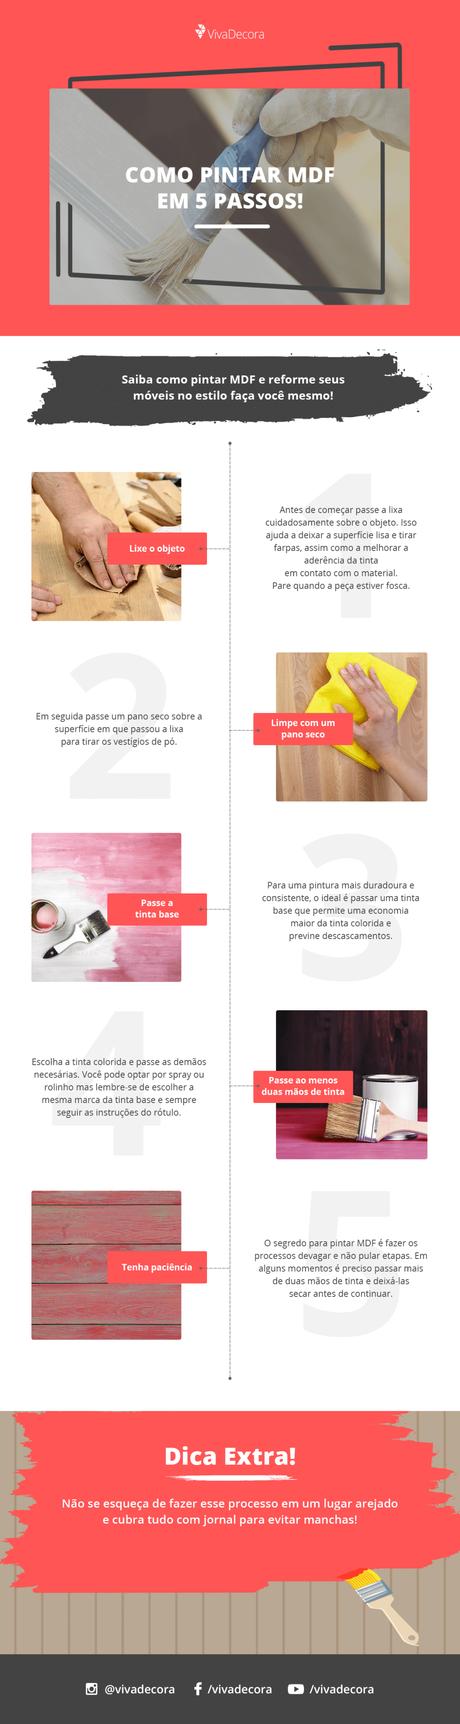 Infográfico – Como Pintar MDF